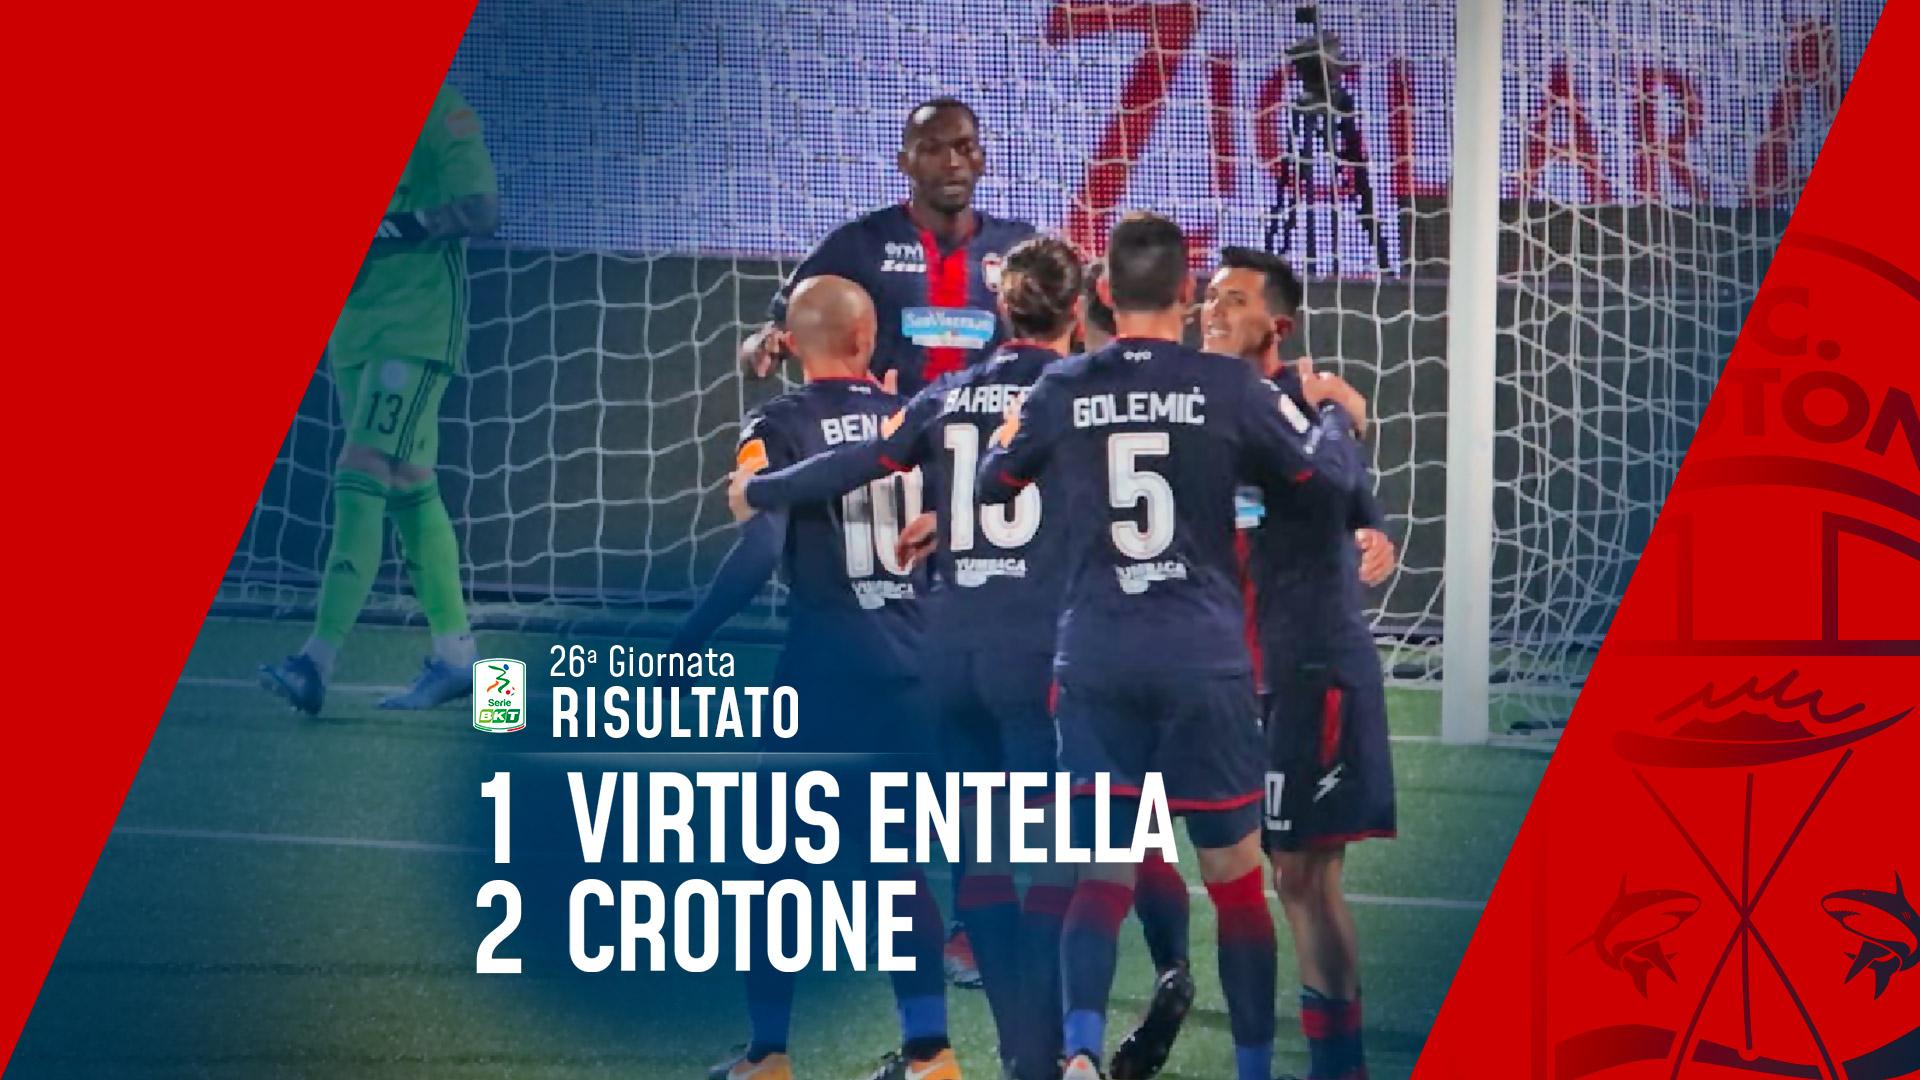 Serie BKT, 26ª giornata: Virtus Entella-Crotone 1-2